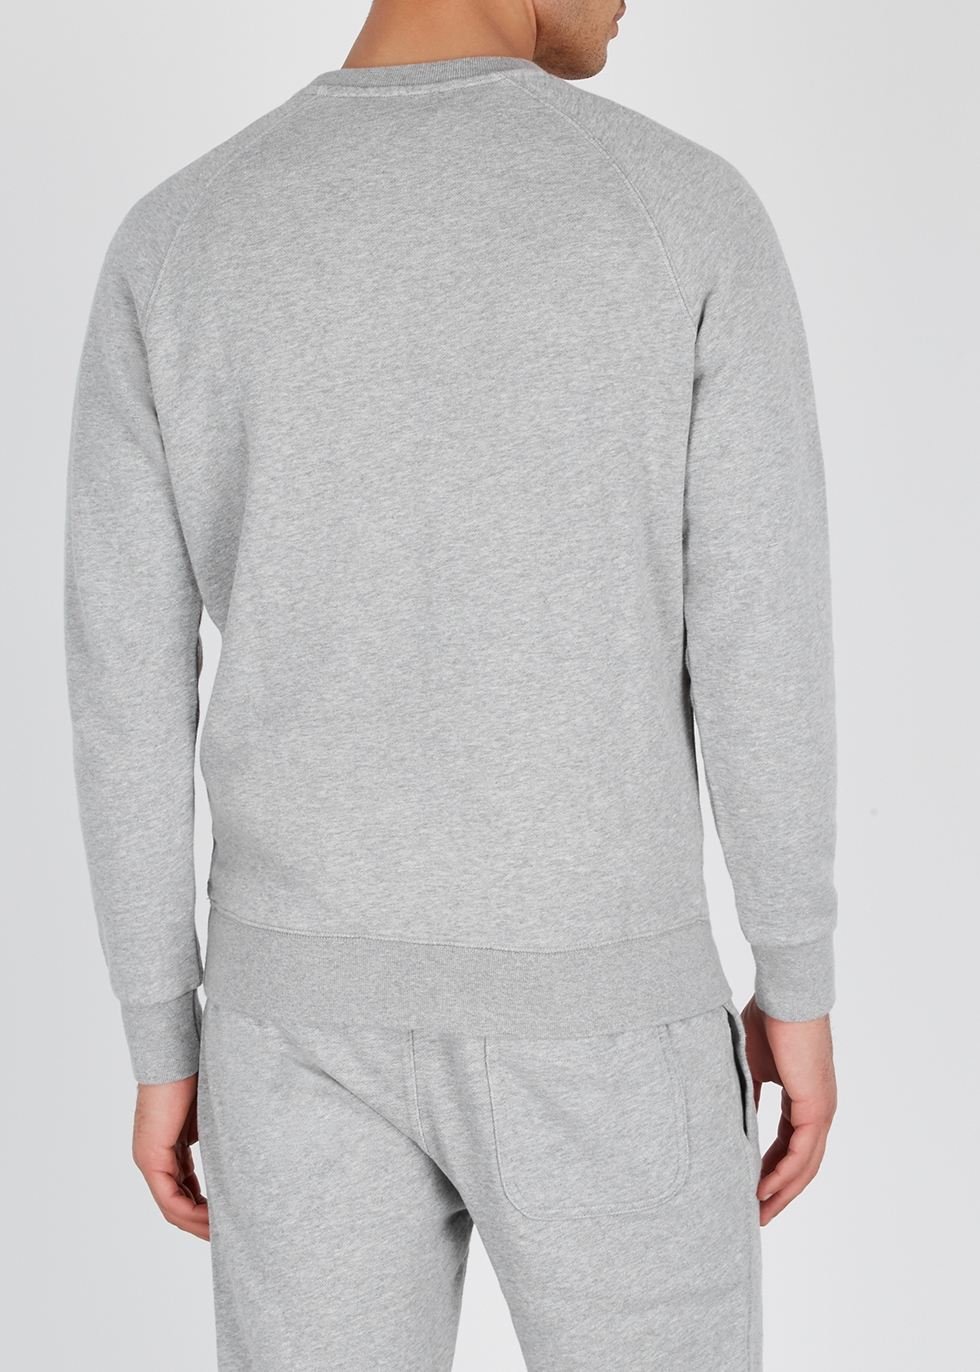 Light grey cotton sweatshirt - Maison Kitsuné